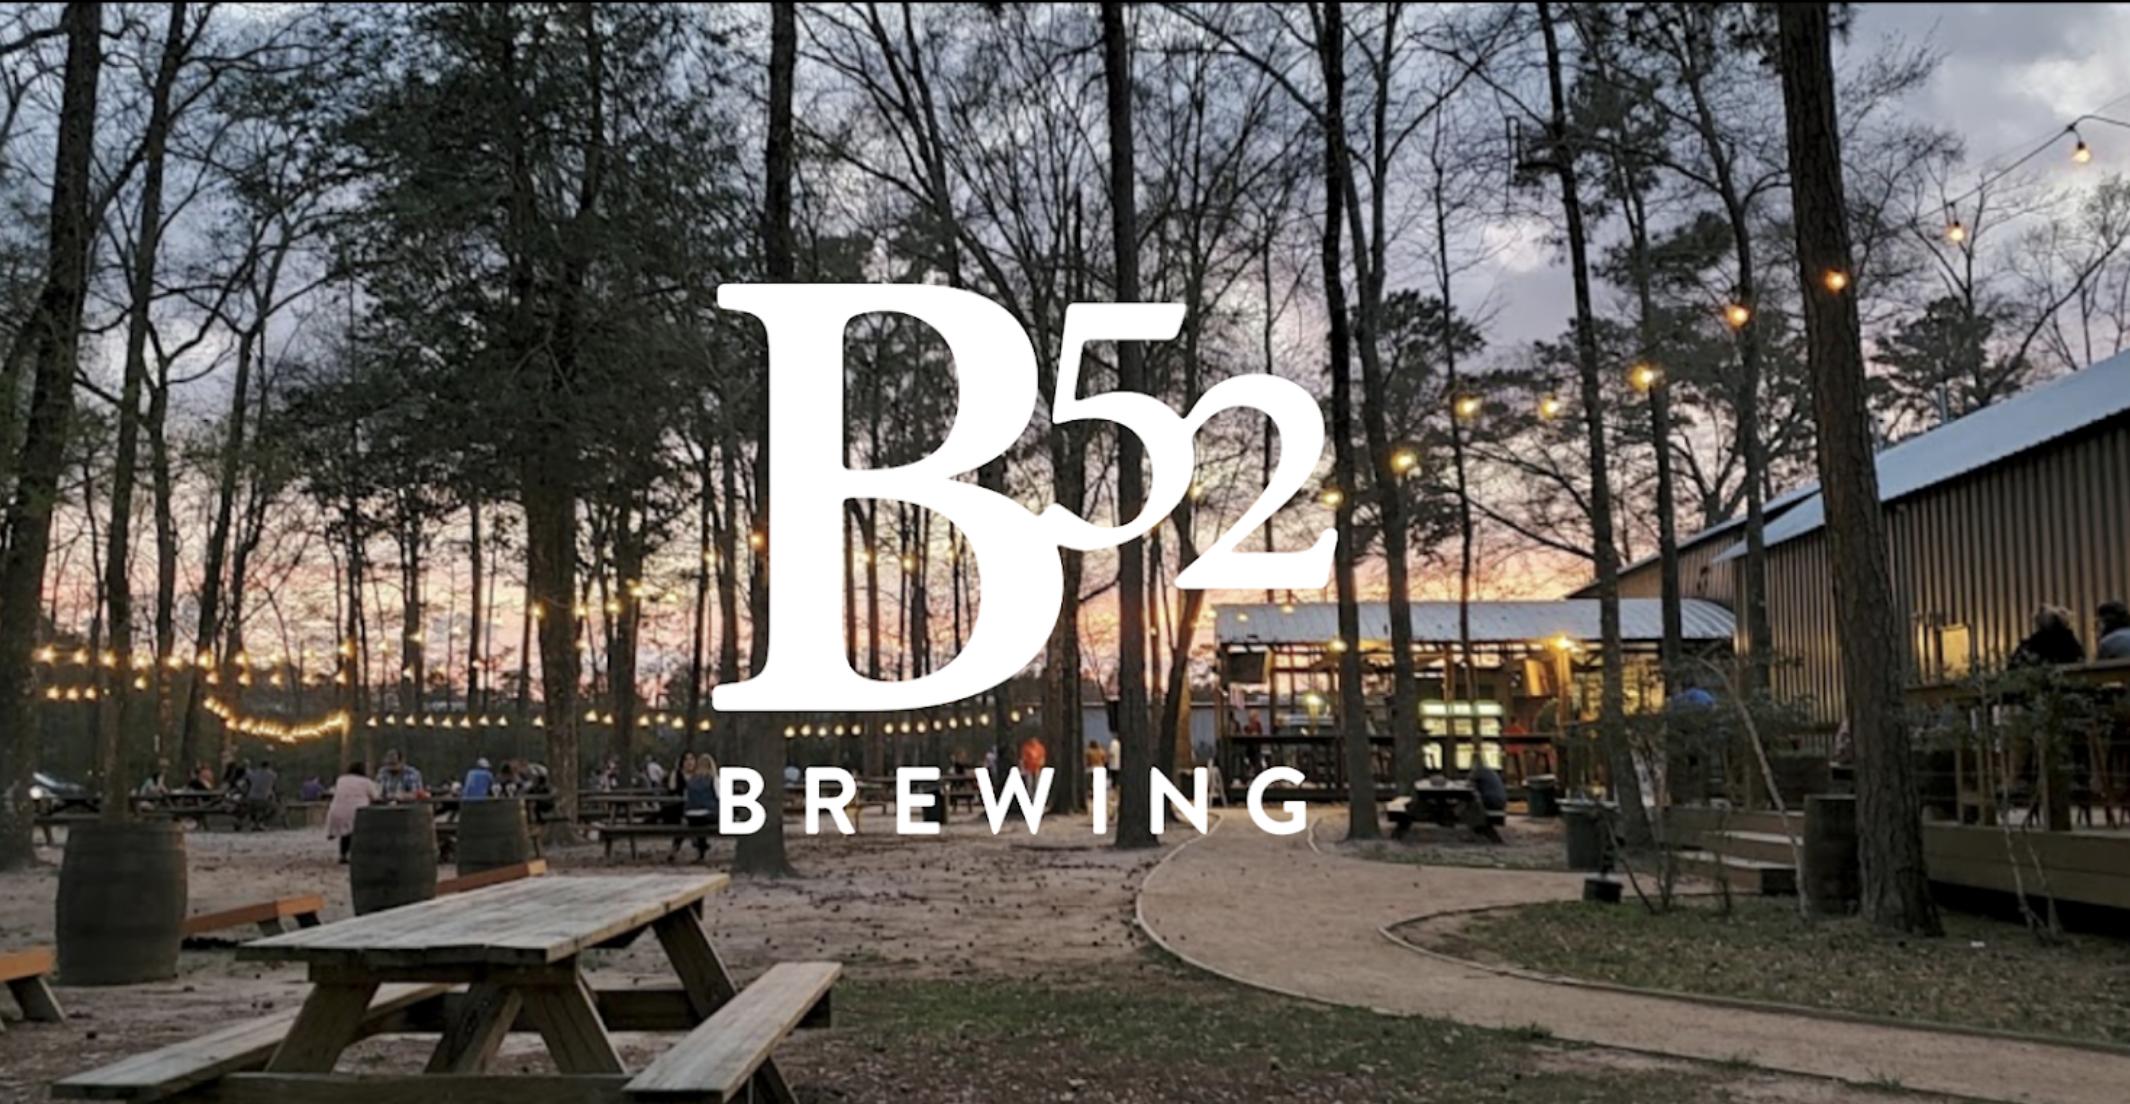 B 52 Brewing Company